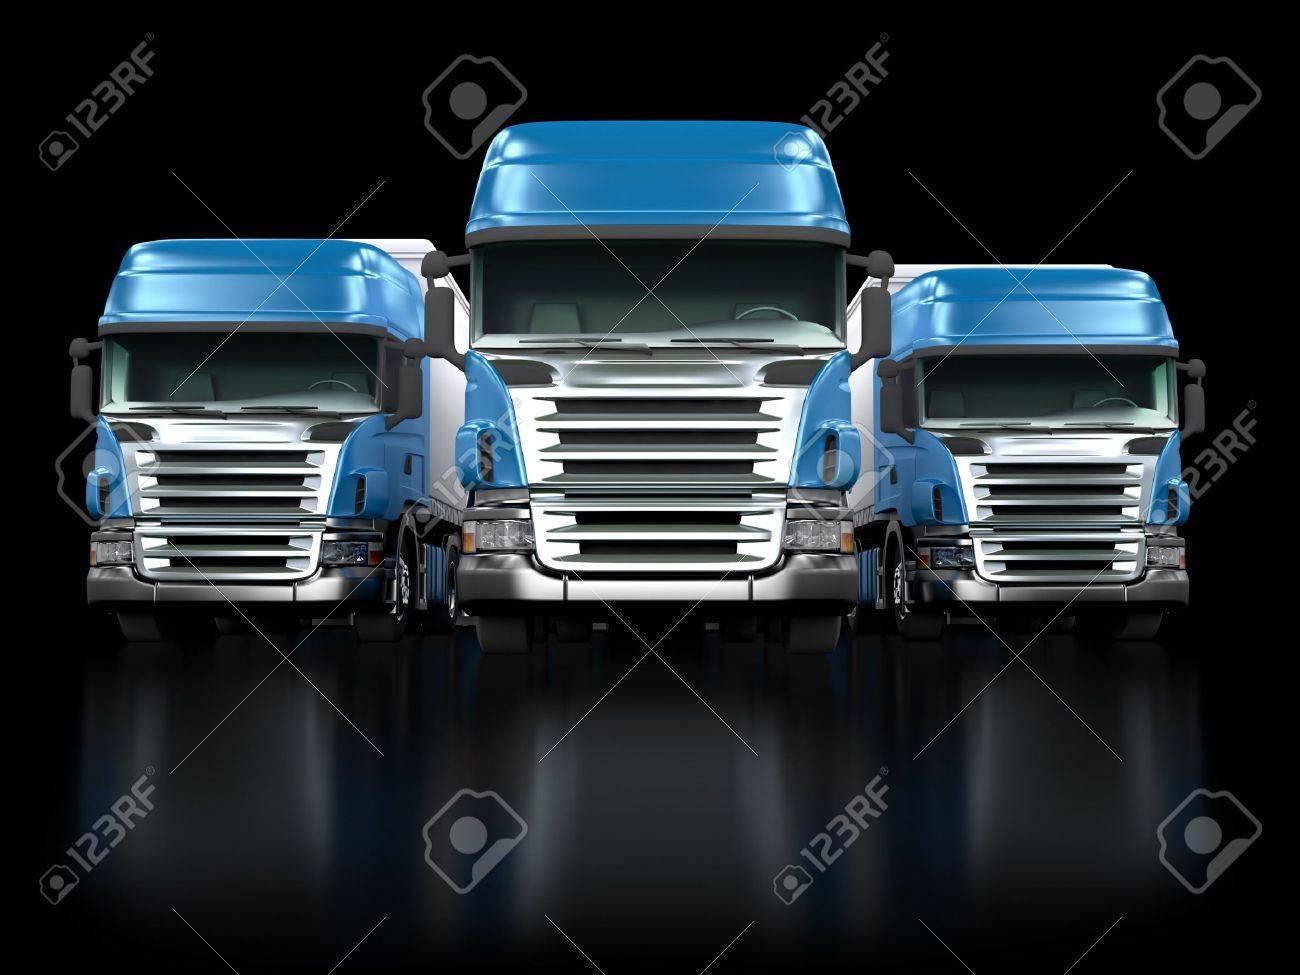 Some blue trucks isolated on black background Stock Photo - 8624866